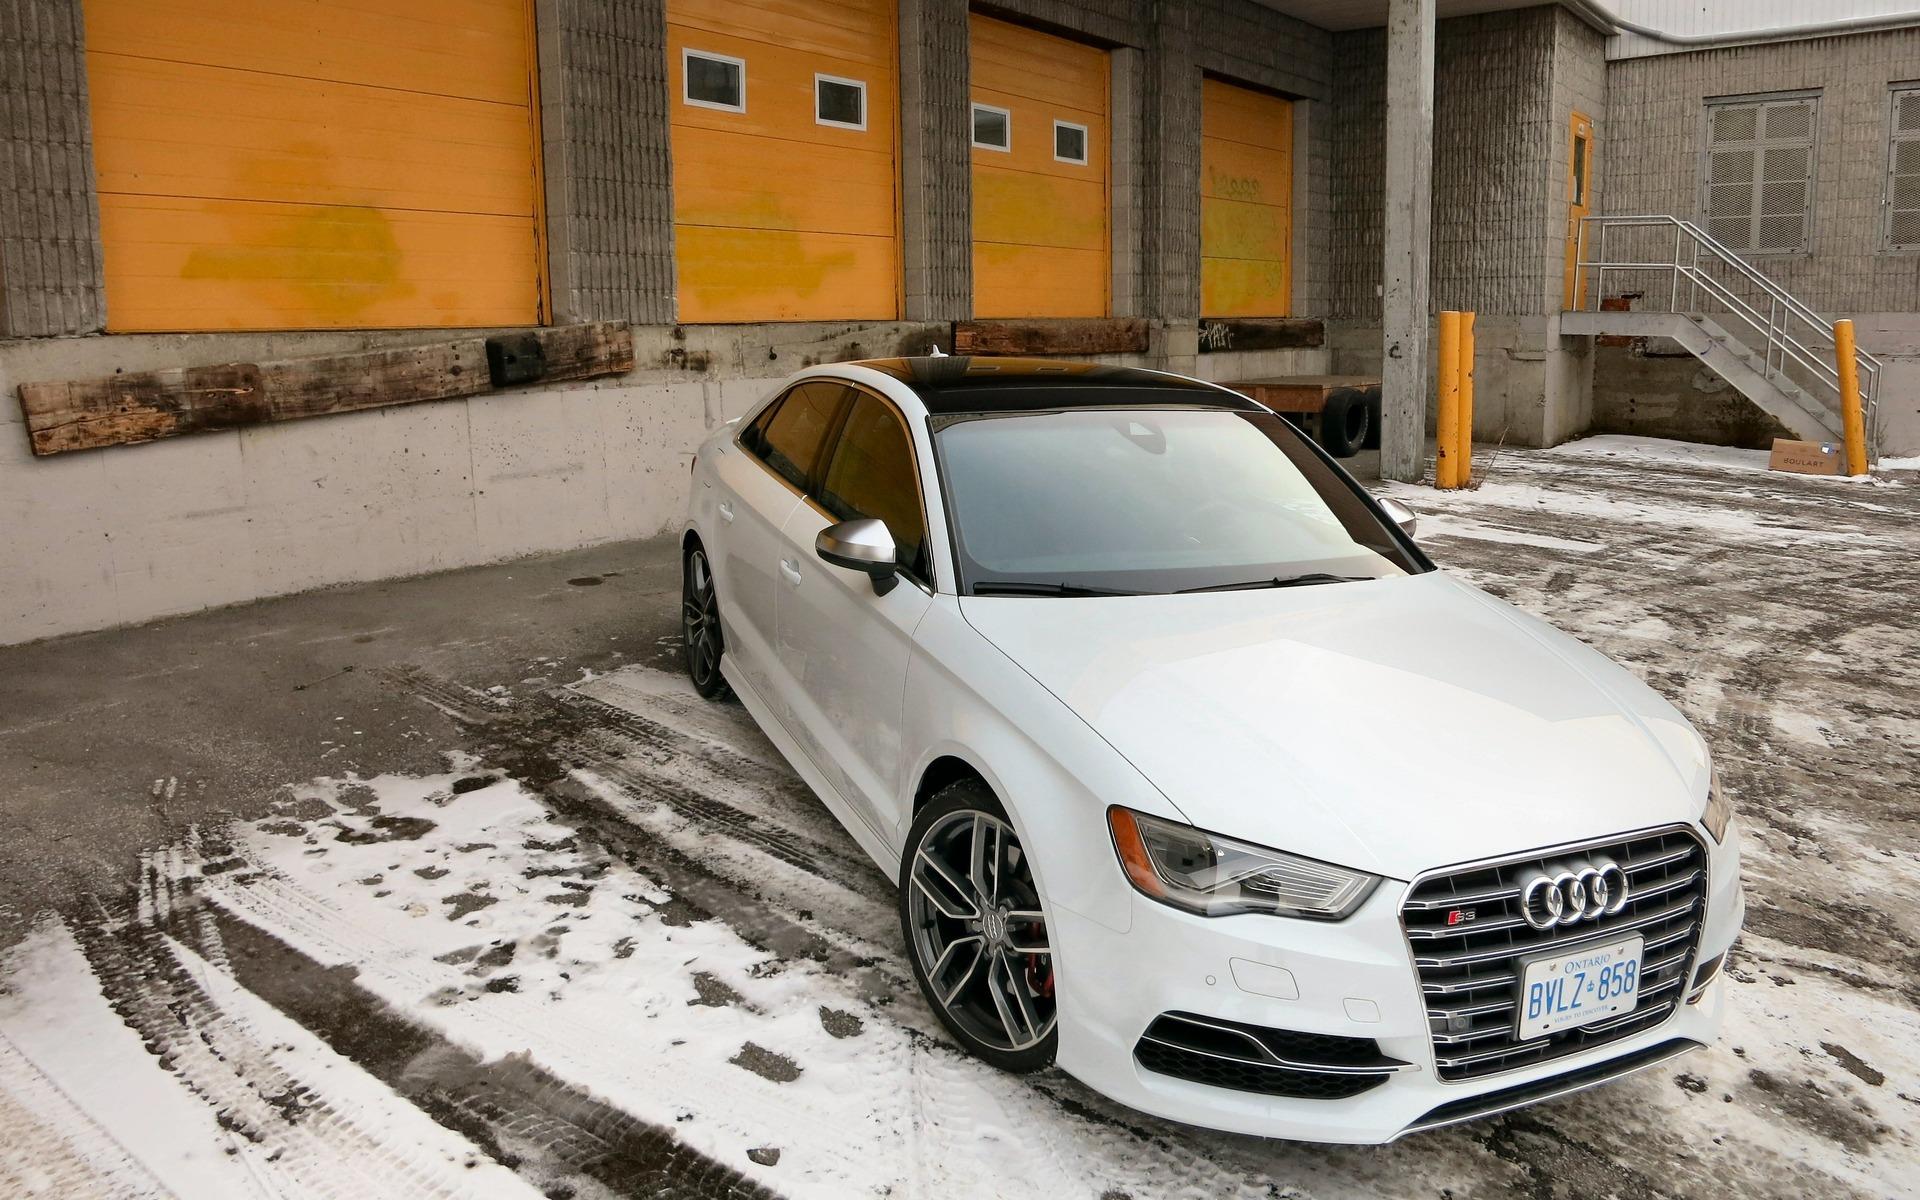 2015 Audi S3 Hero Revisited 10 20